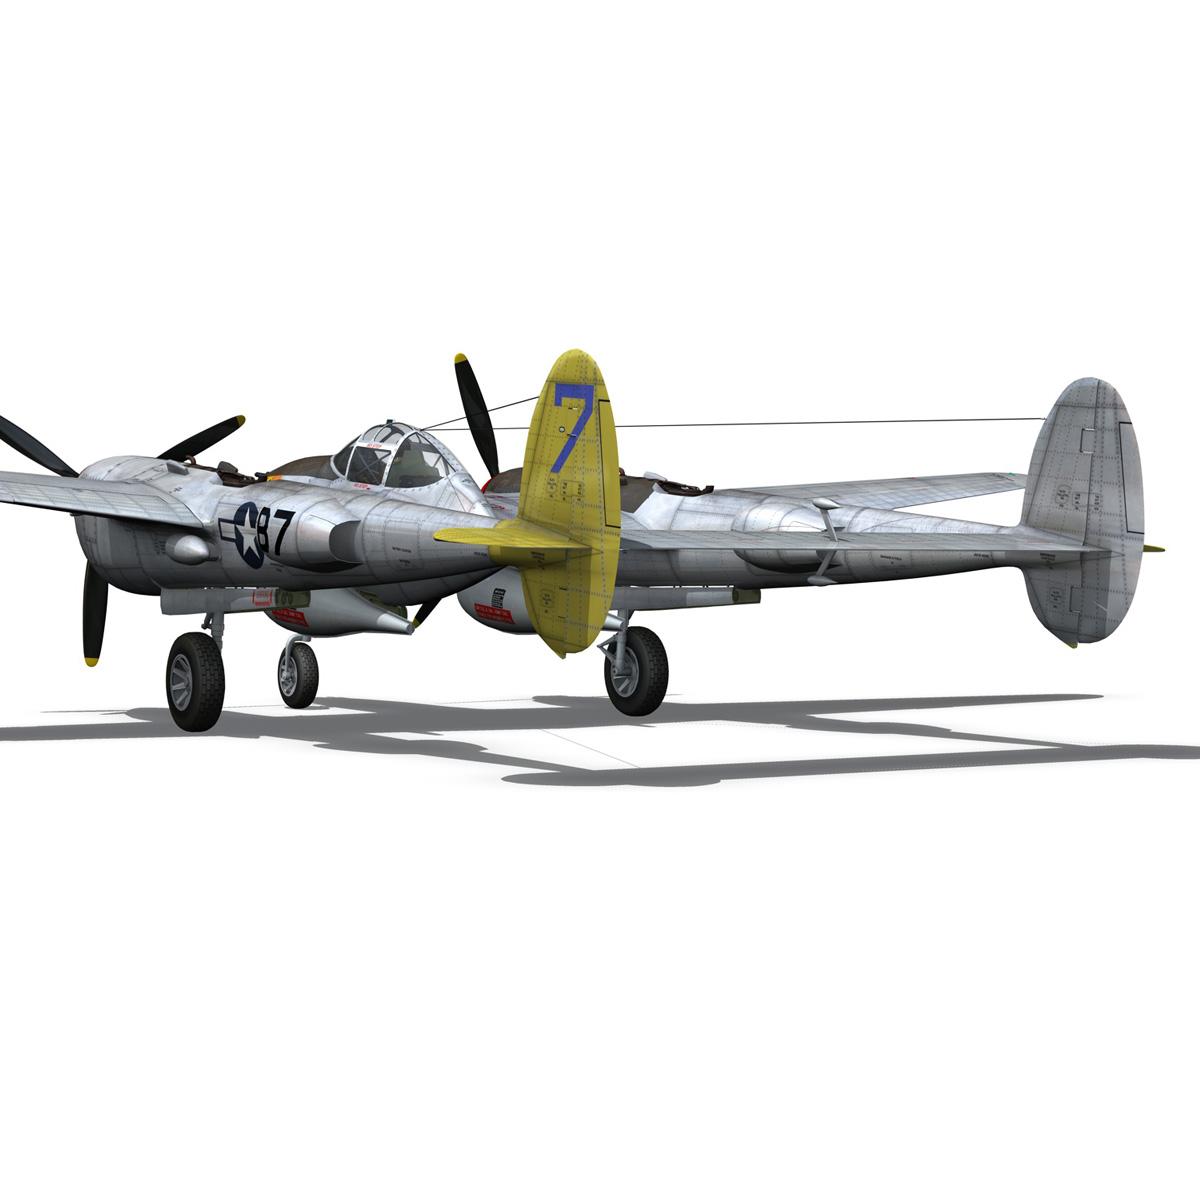 lockheed p-38 lightning – beautiful bitch 3d model fbx c4d lwo obj 272673